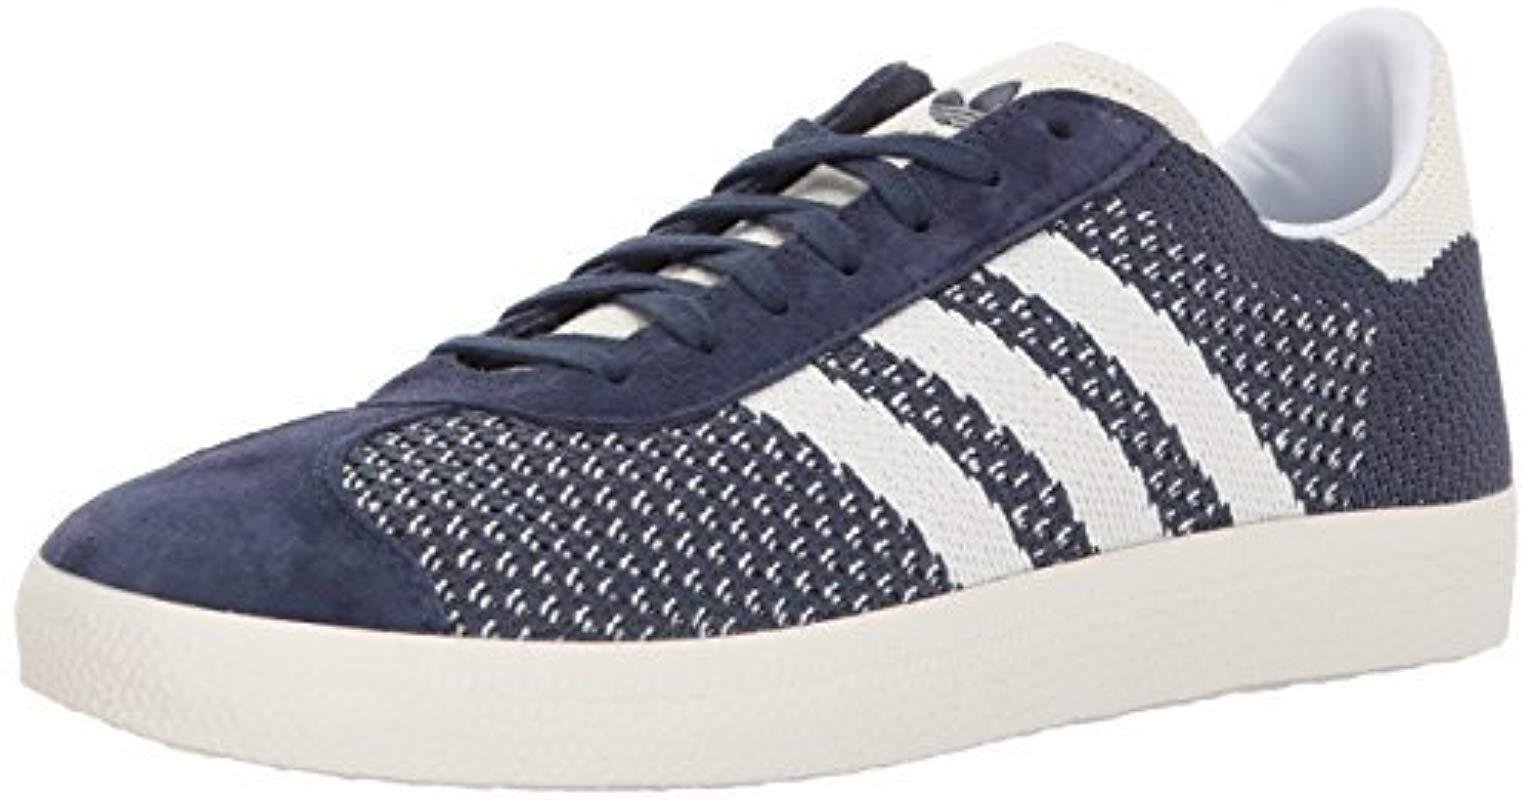 adidas Originals Gazelle Pk Sneaker in Blue for Men - Lyst